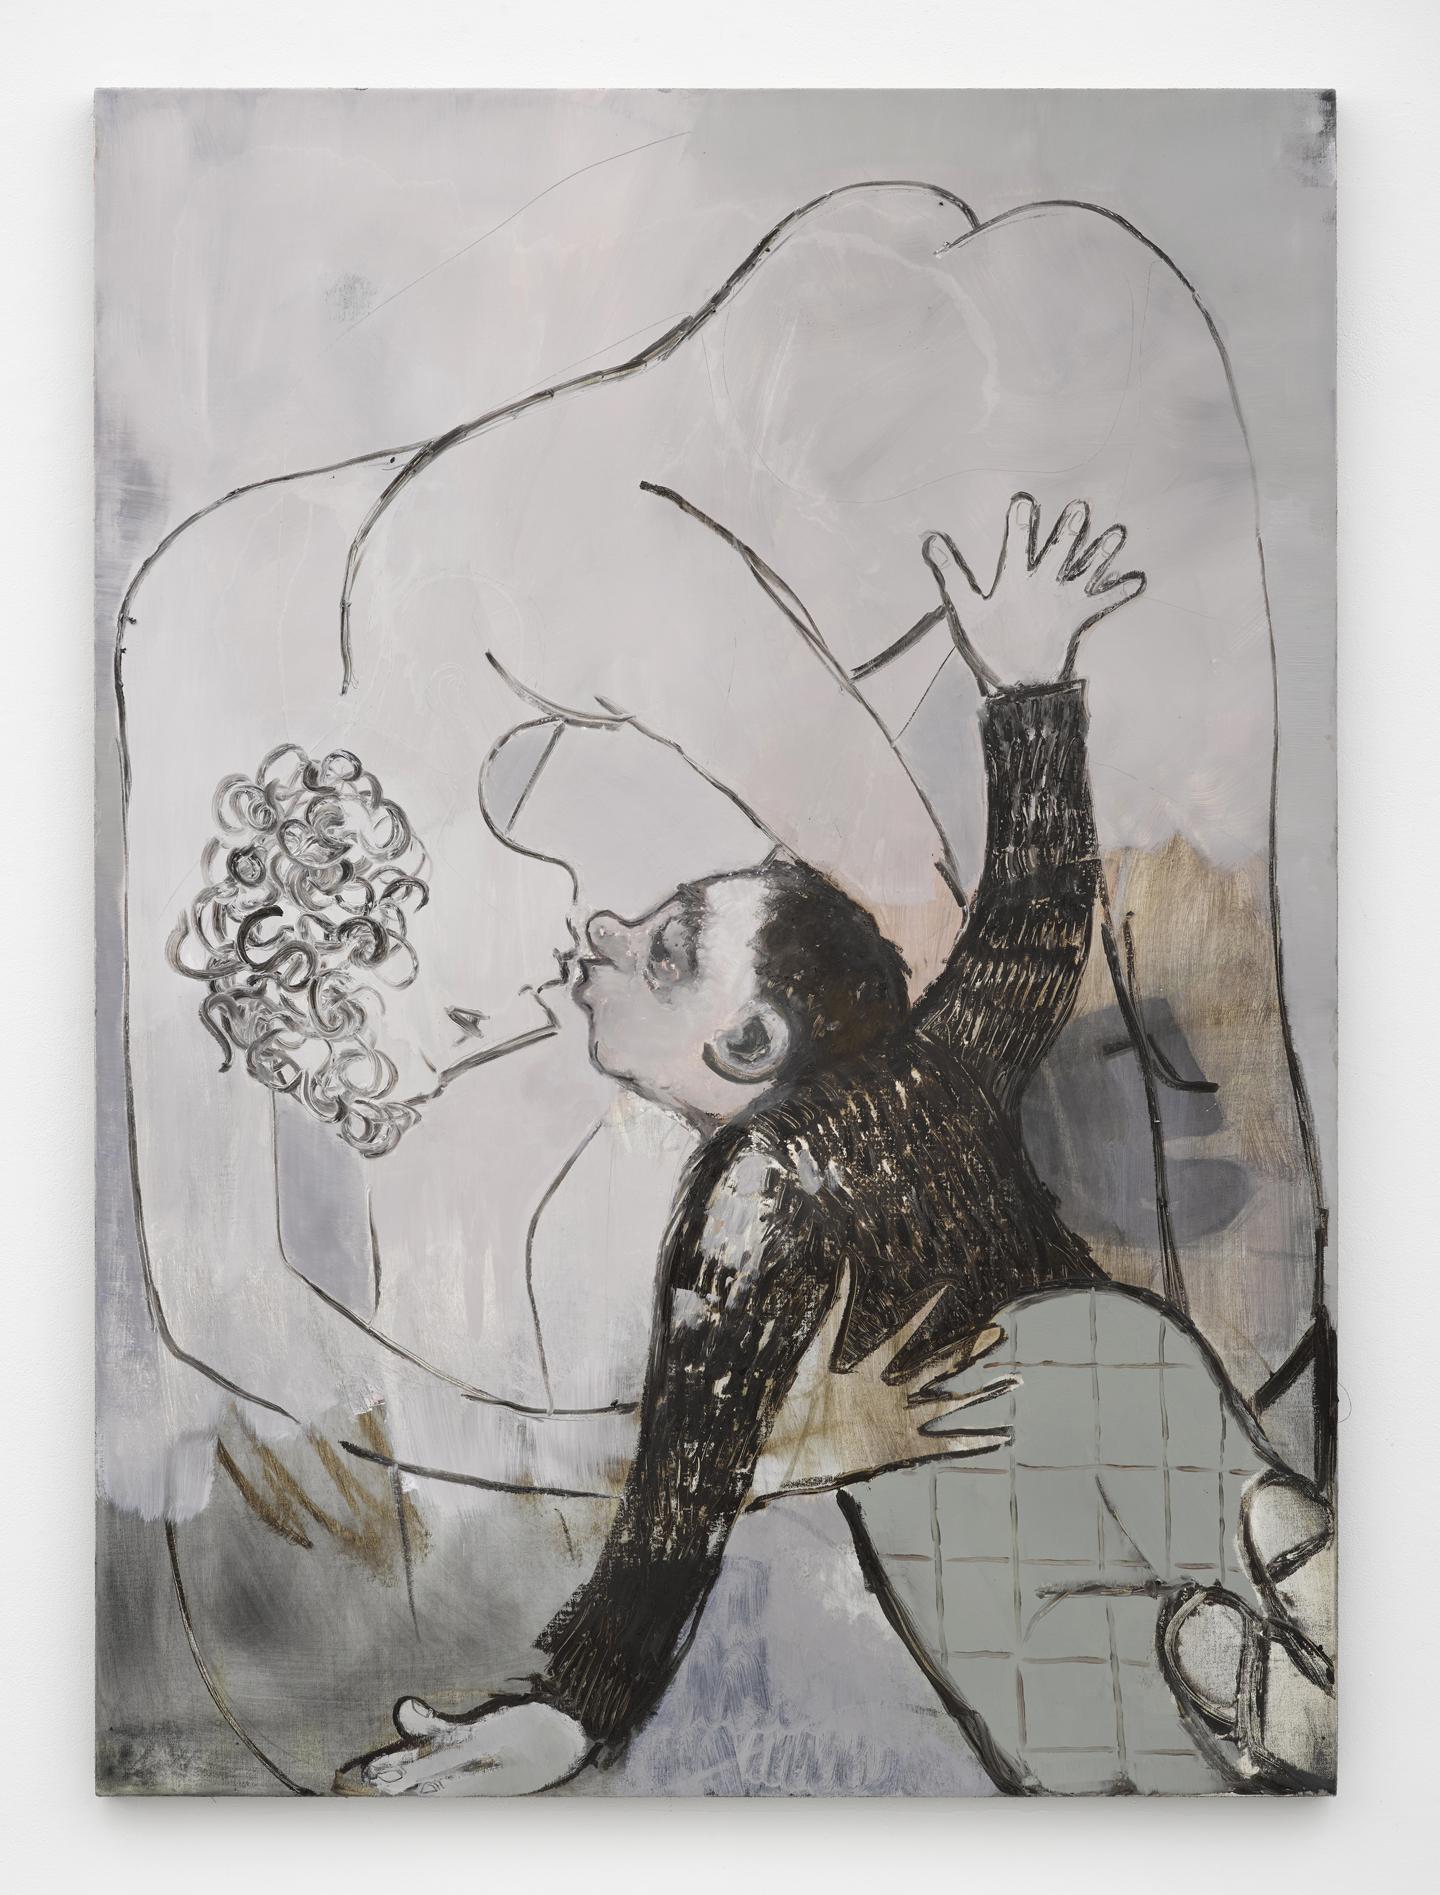 Sanya Kantarovsky, No Down No Feather (after Eisenstein), 2015. Courtesy: Stuart Shave/Modern Art, London. Photo: Ben Westoby